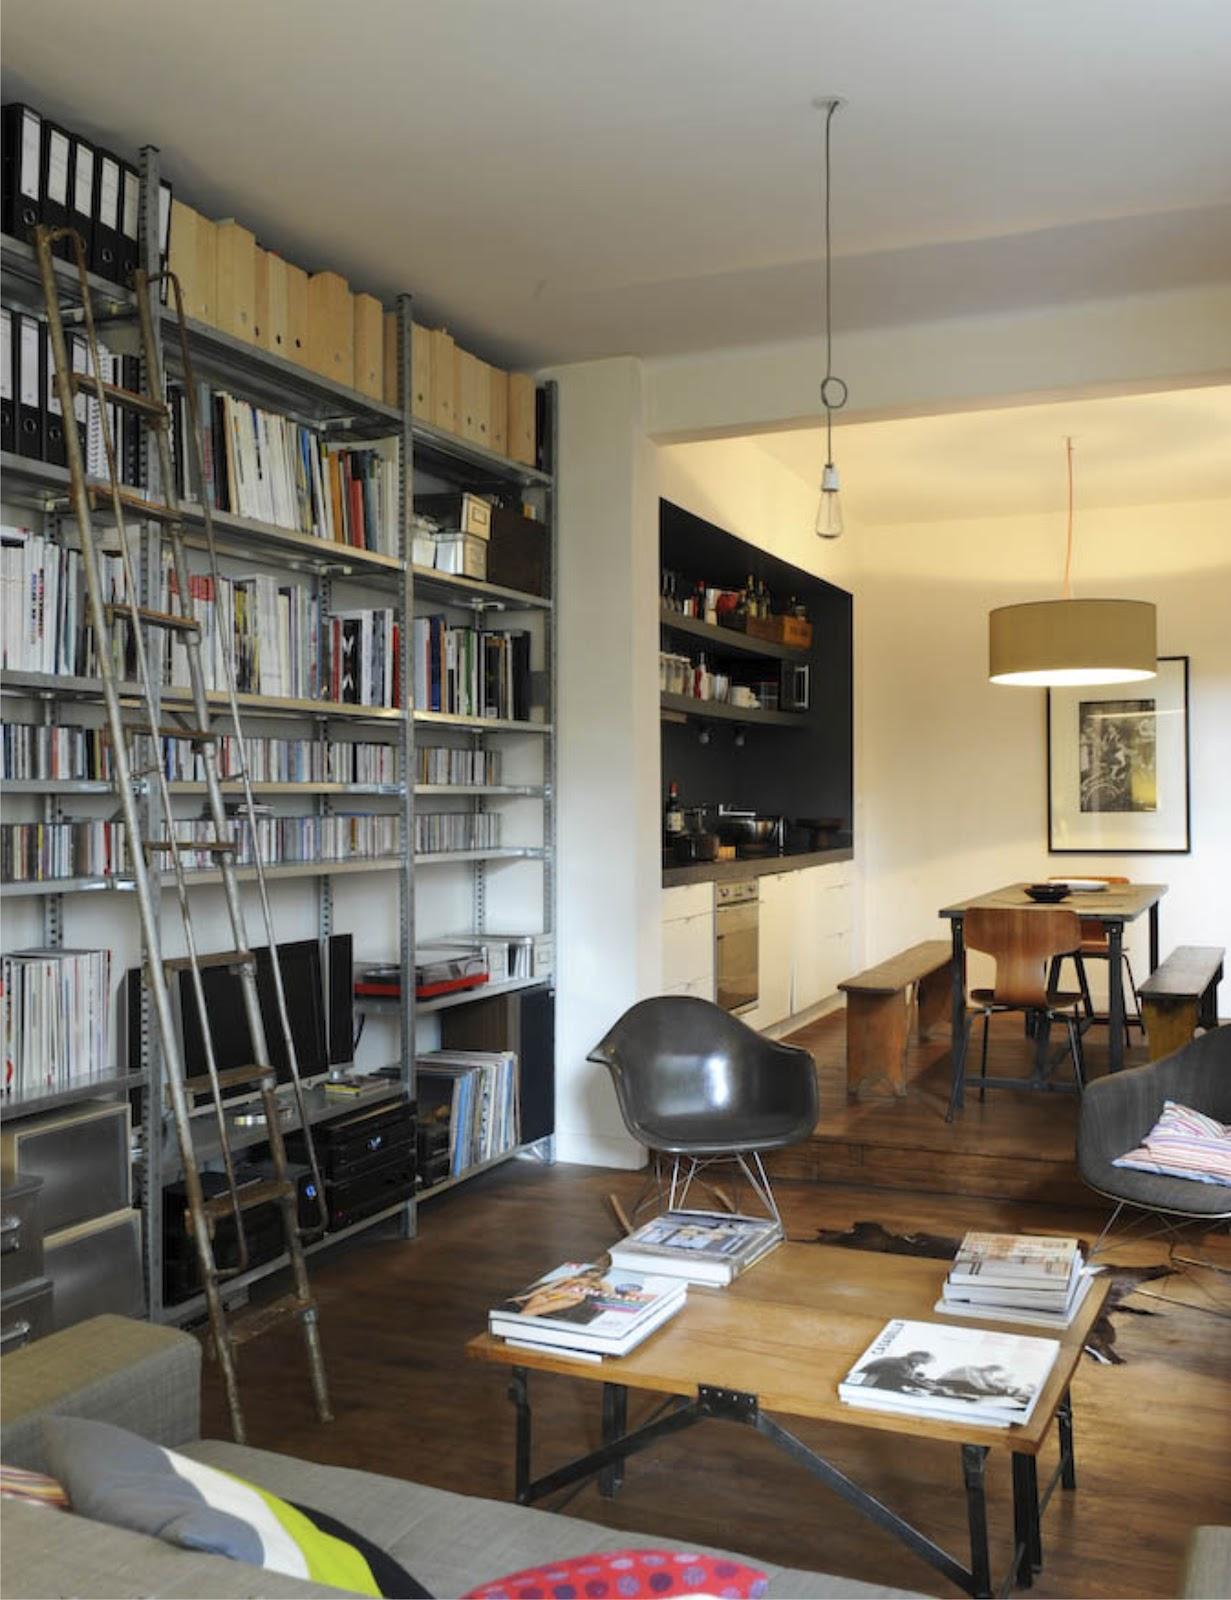 Mini apartamento vintage chic decoraci n for Decoracion de mini apartamentos